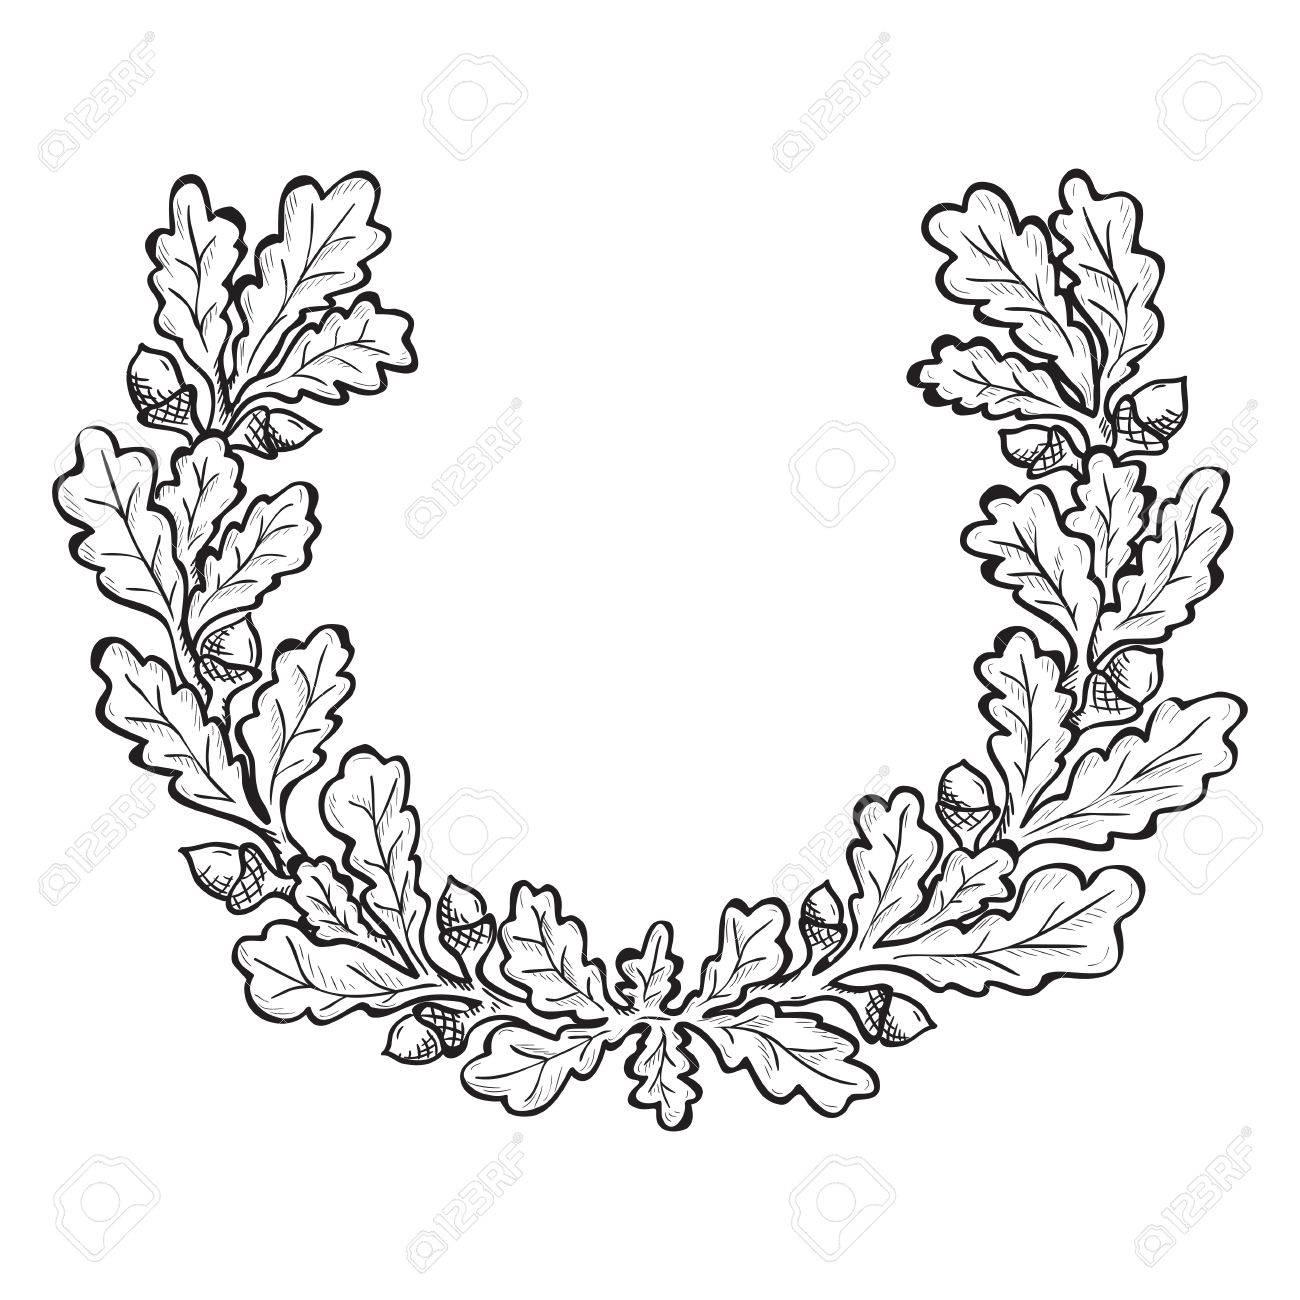 artistic hand drawn illustration of oak wreath ink drawing